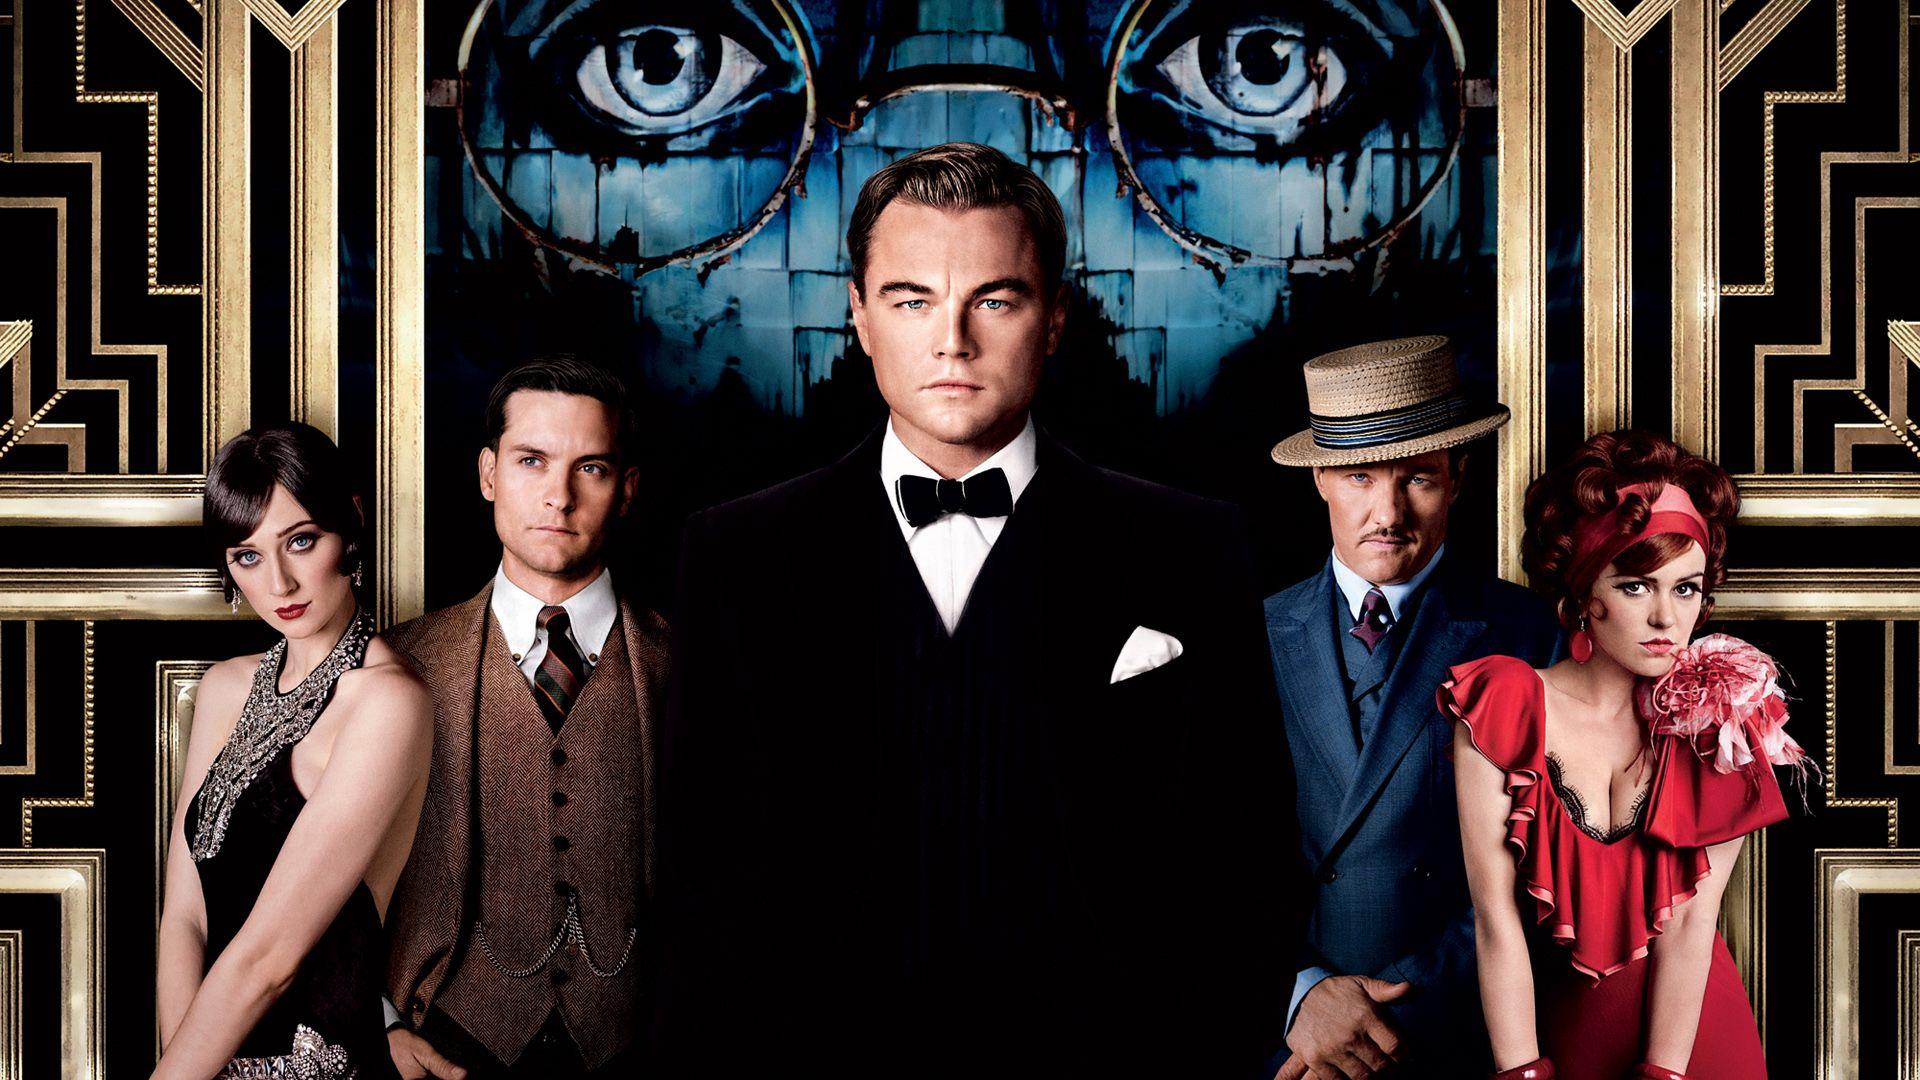 Great Gatsby new wallpaper